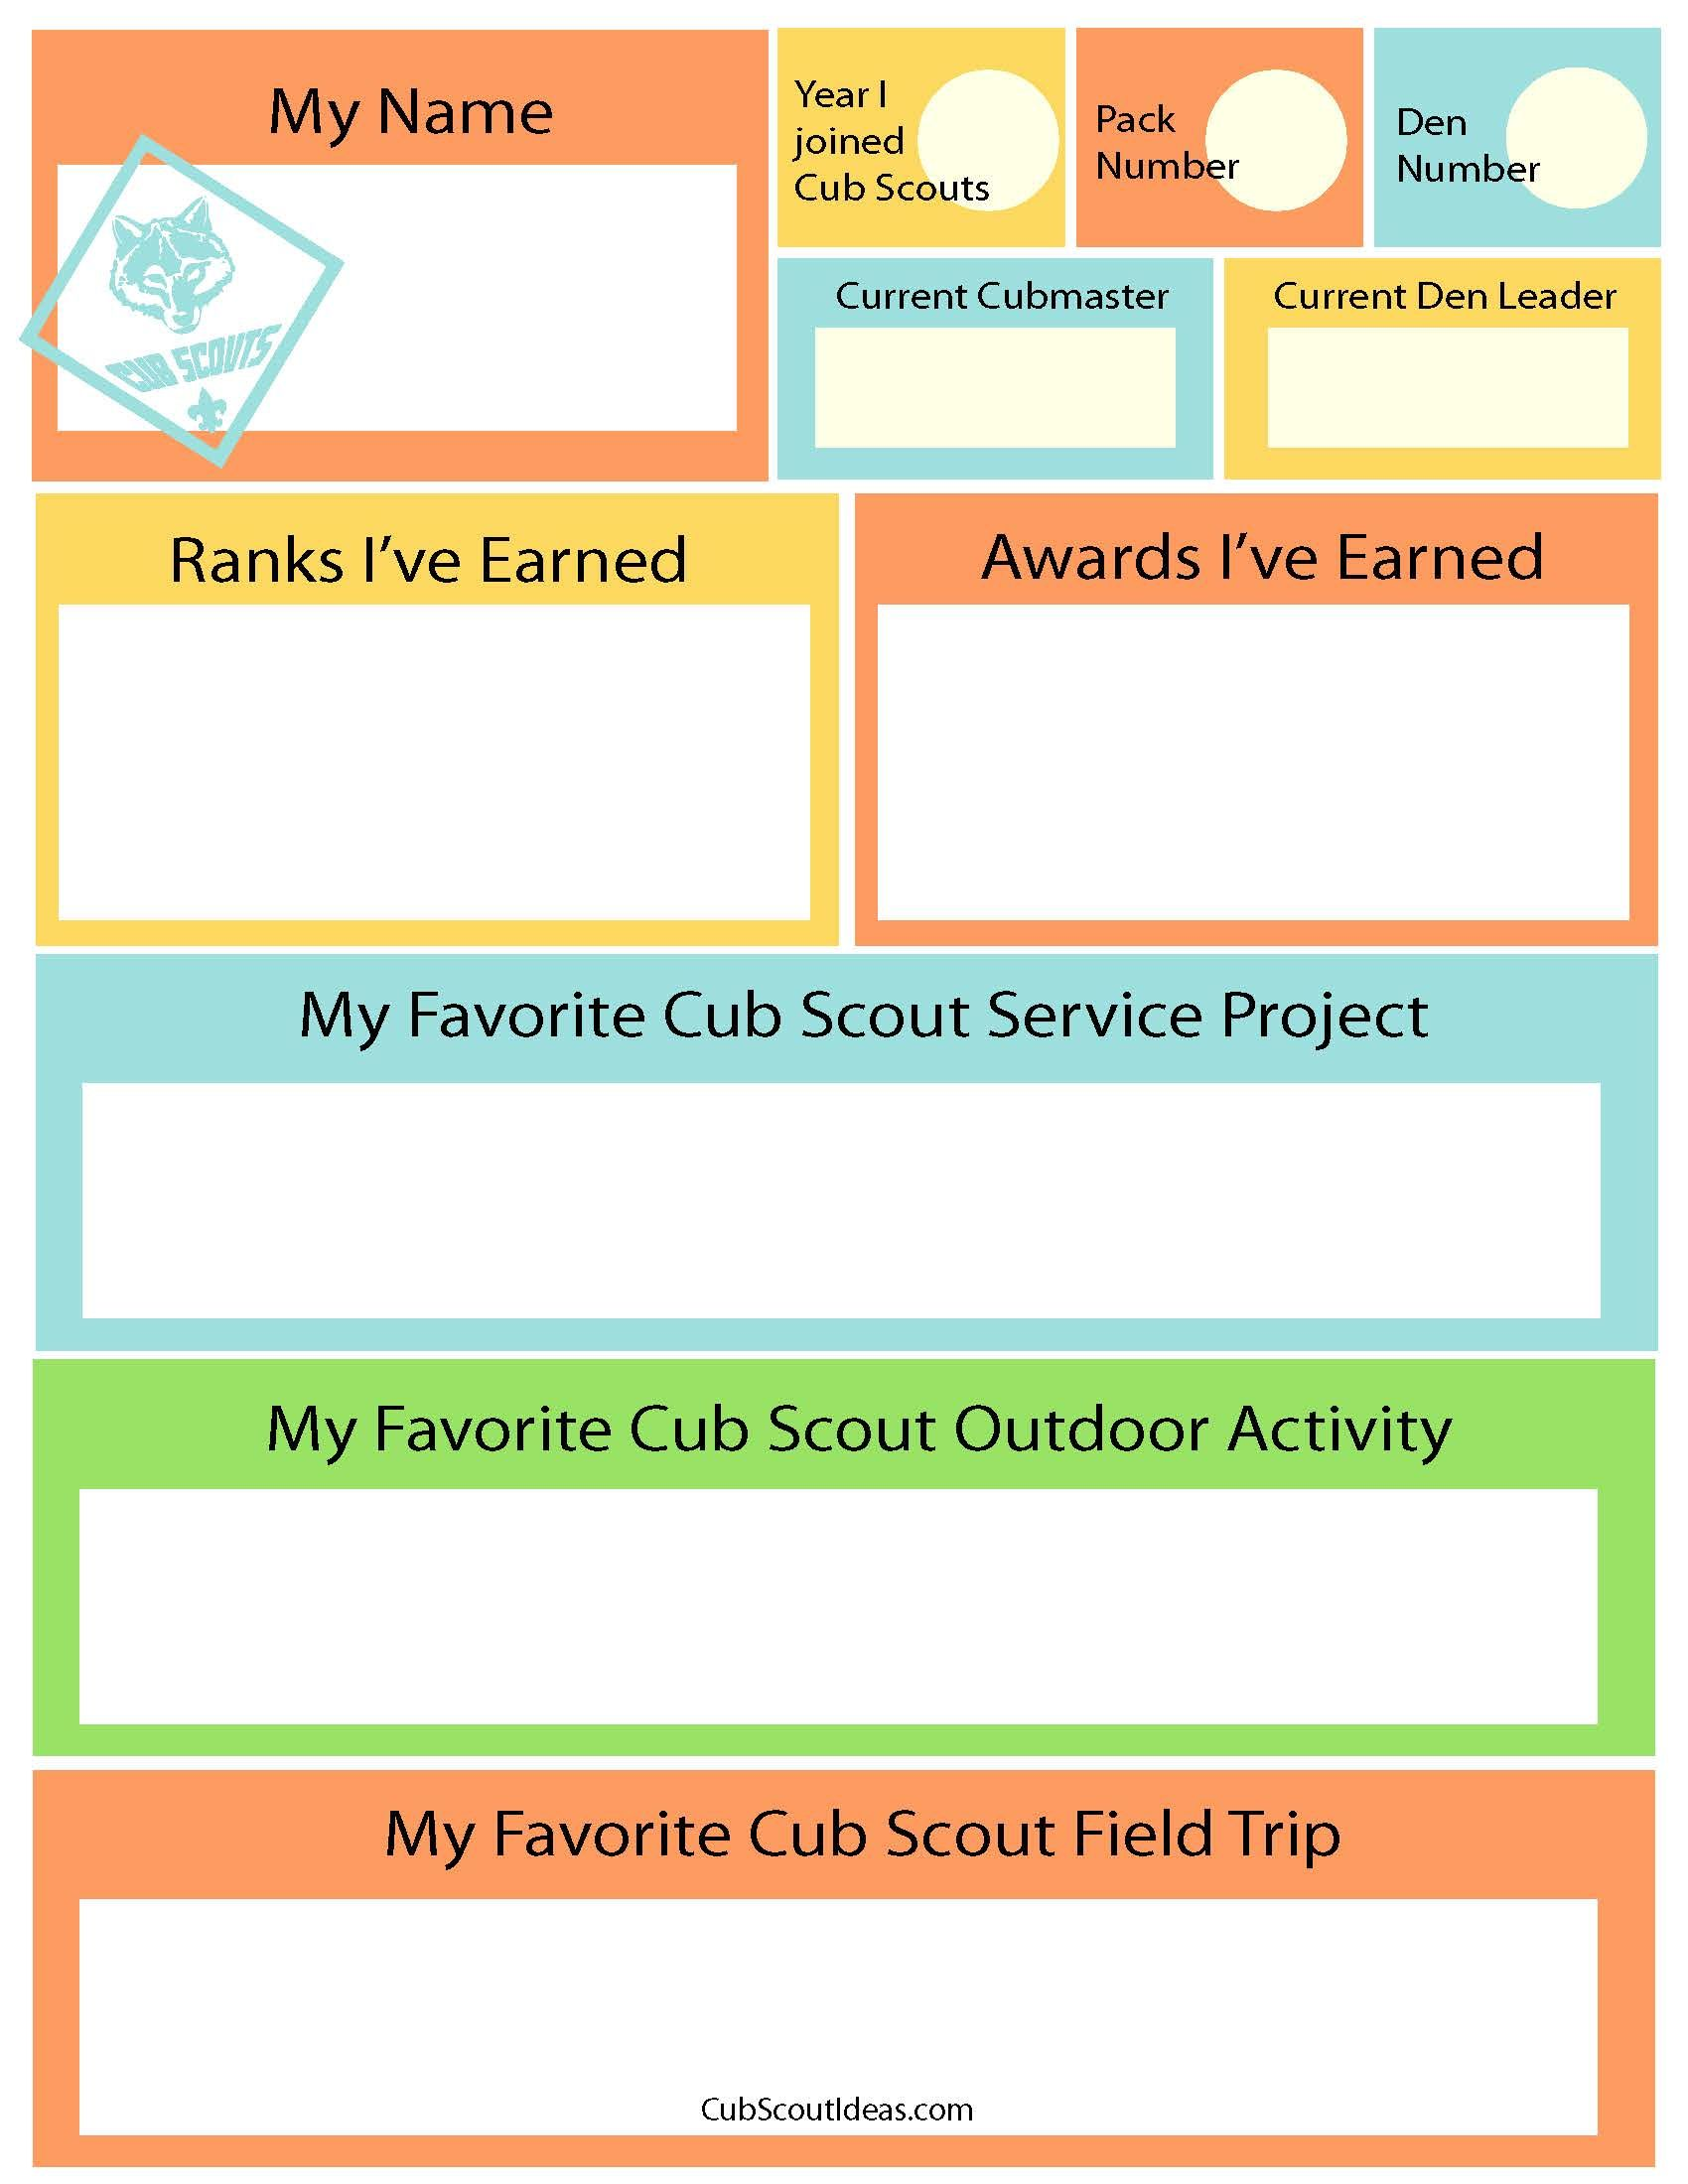 Free Printable Time Capsule Questionnaire for Cub Scouts ~ Cub Scout Ideas